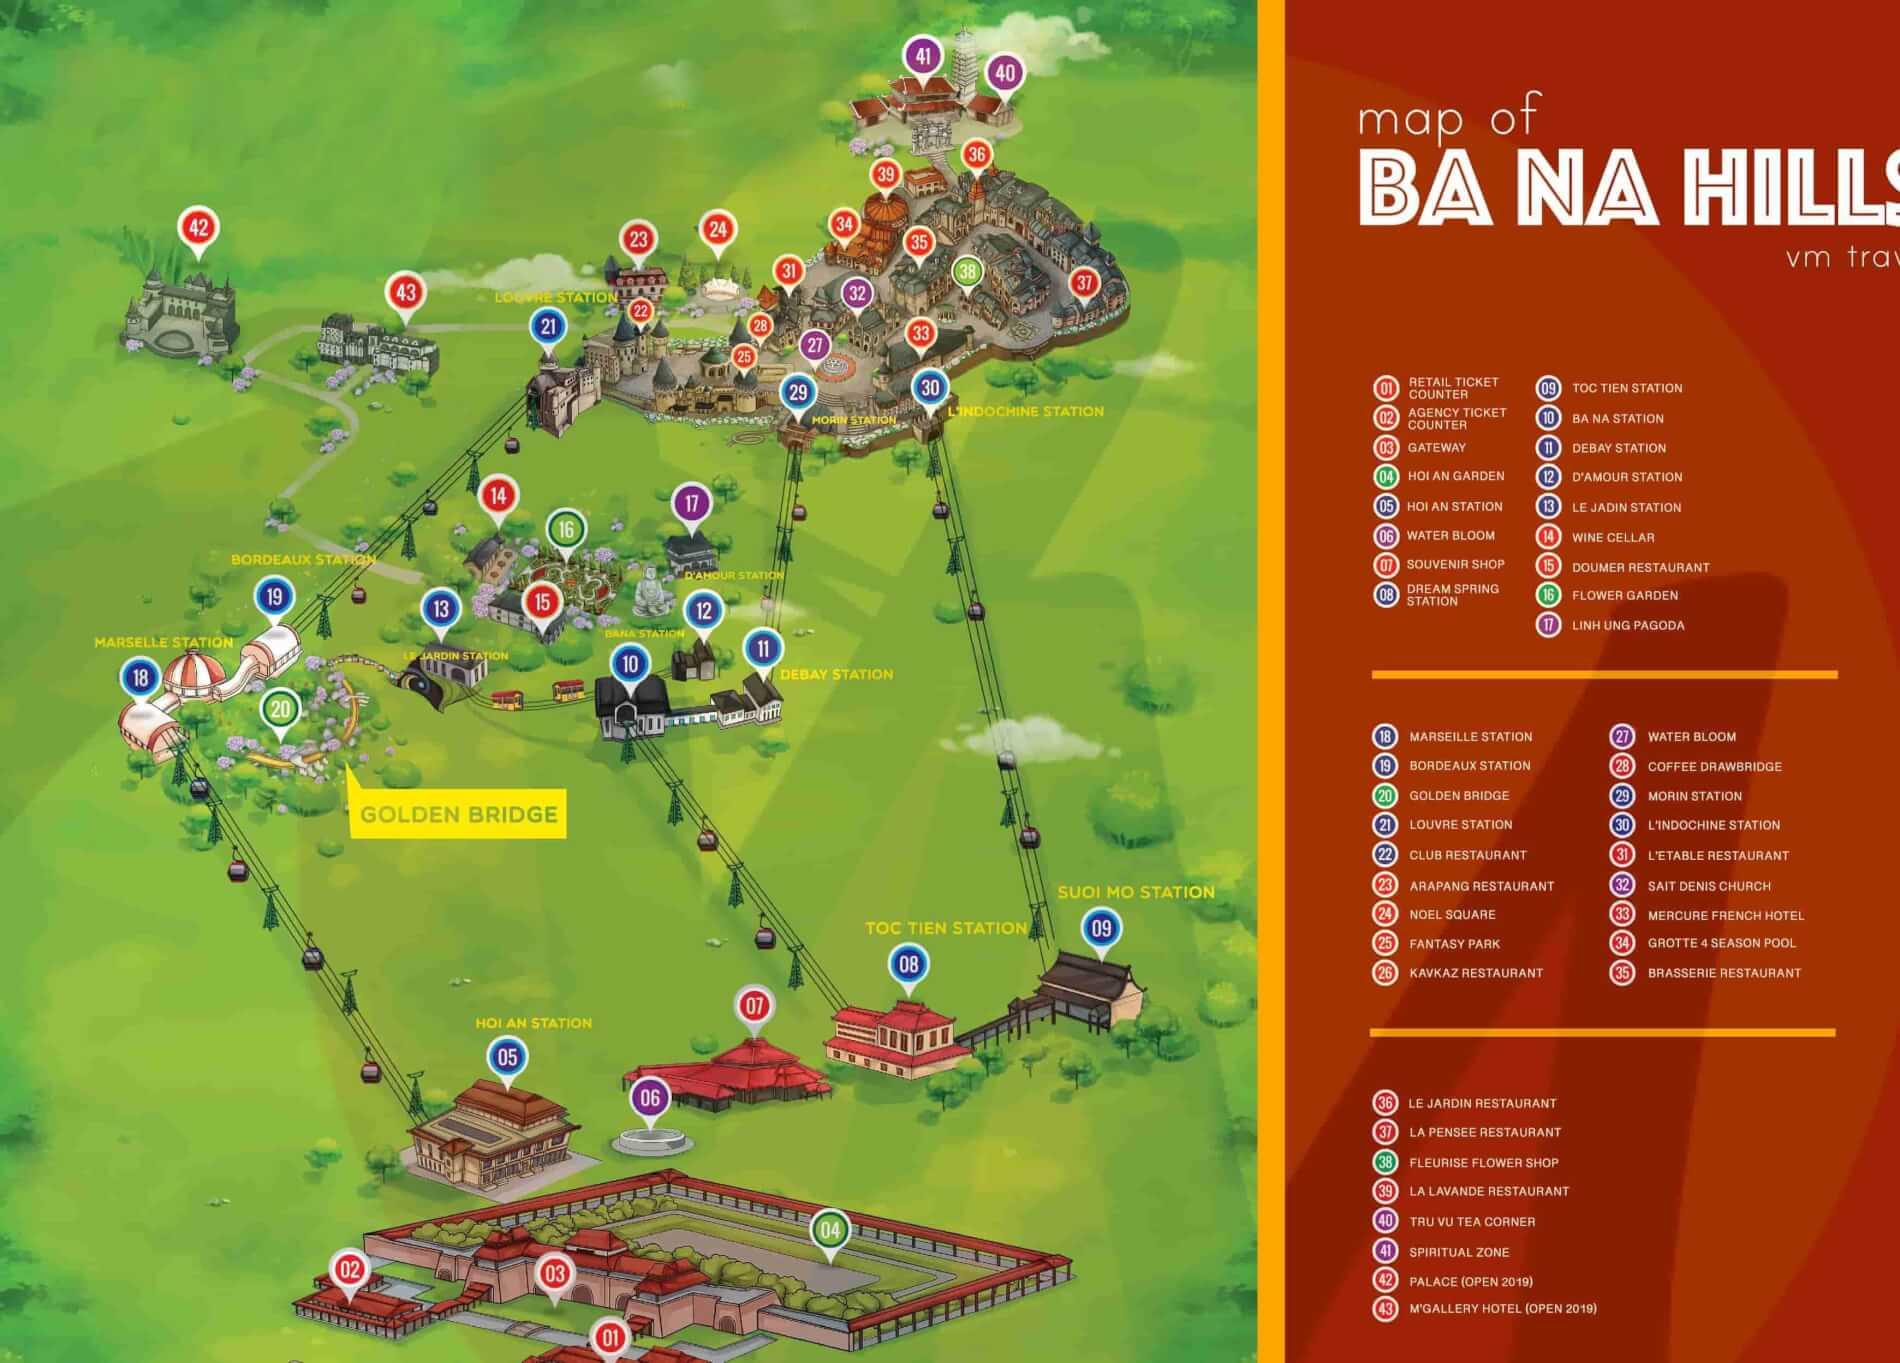 Map of Ba Na Hills